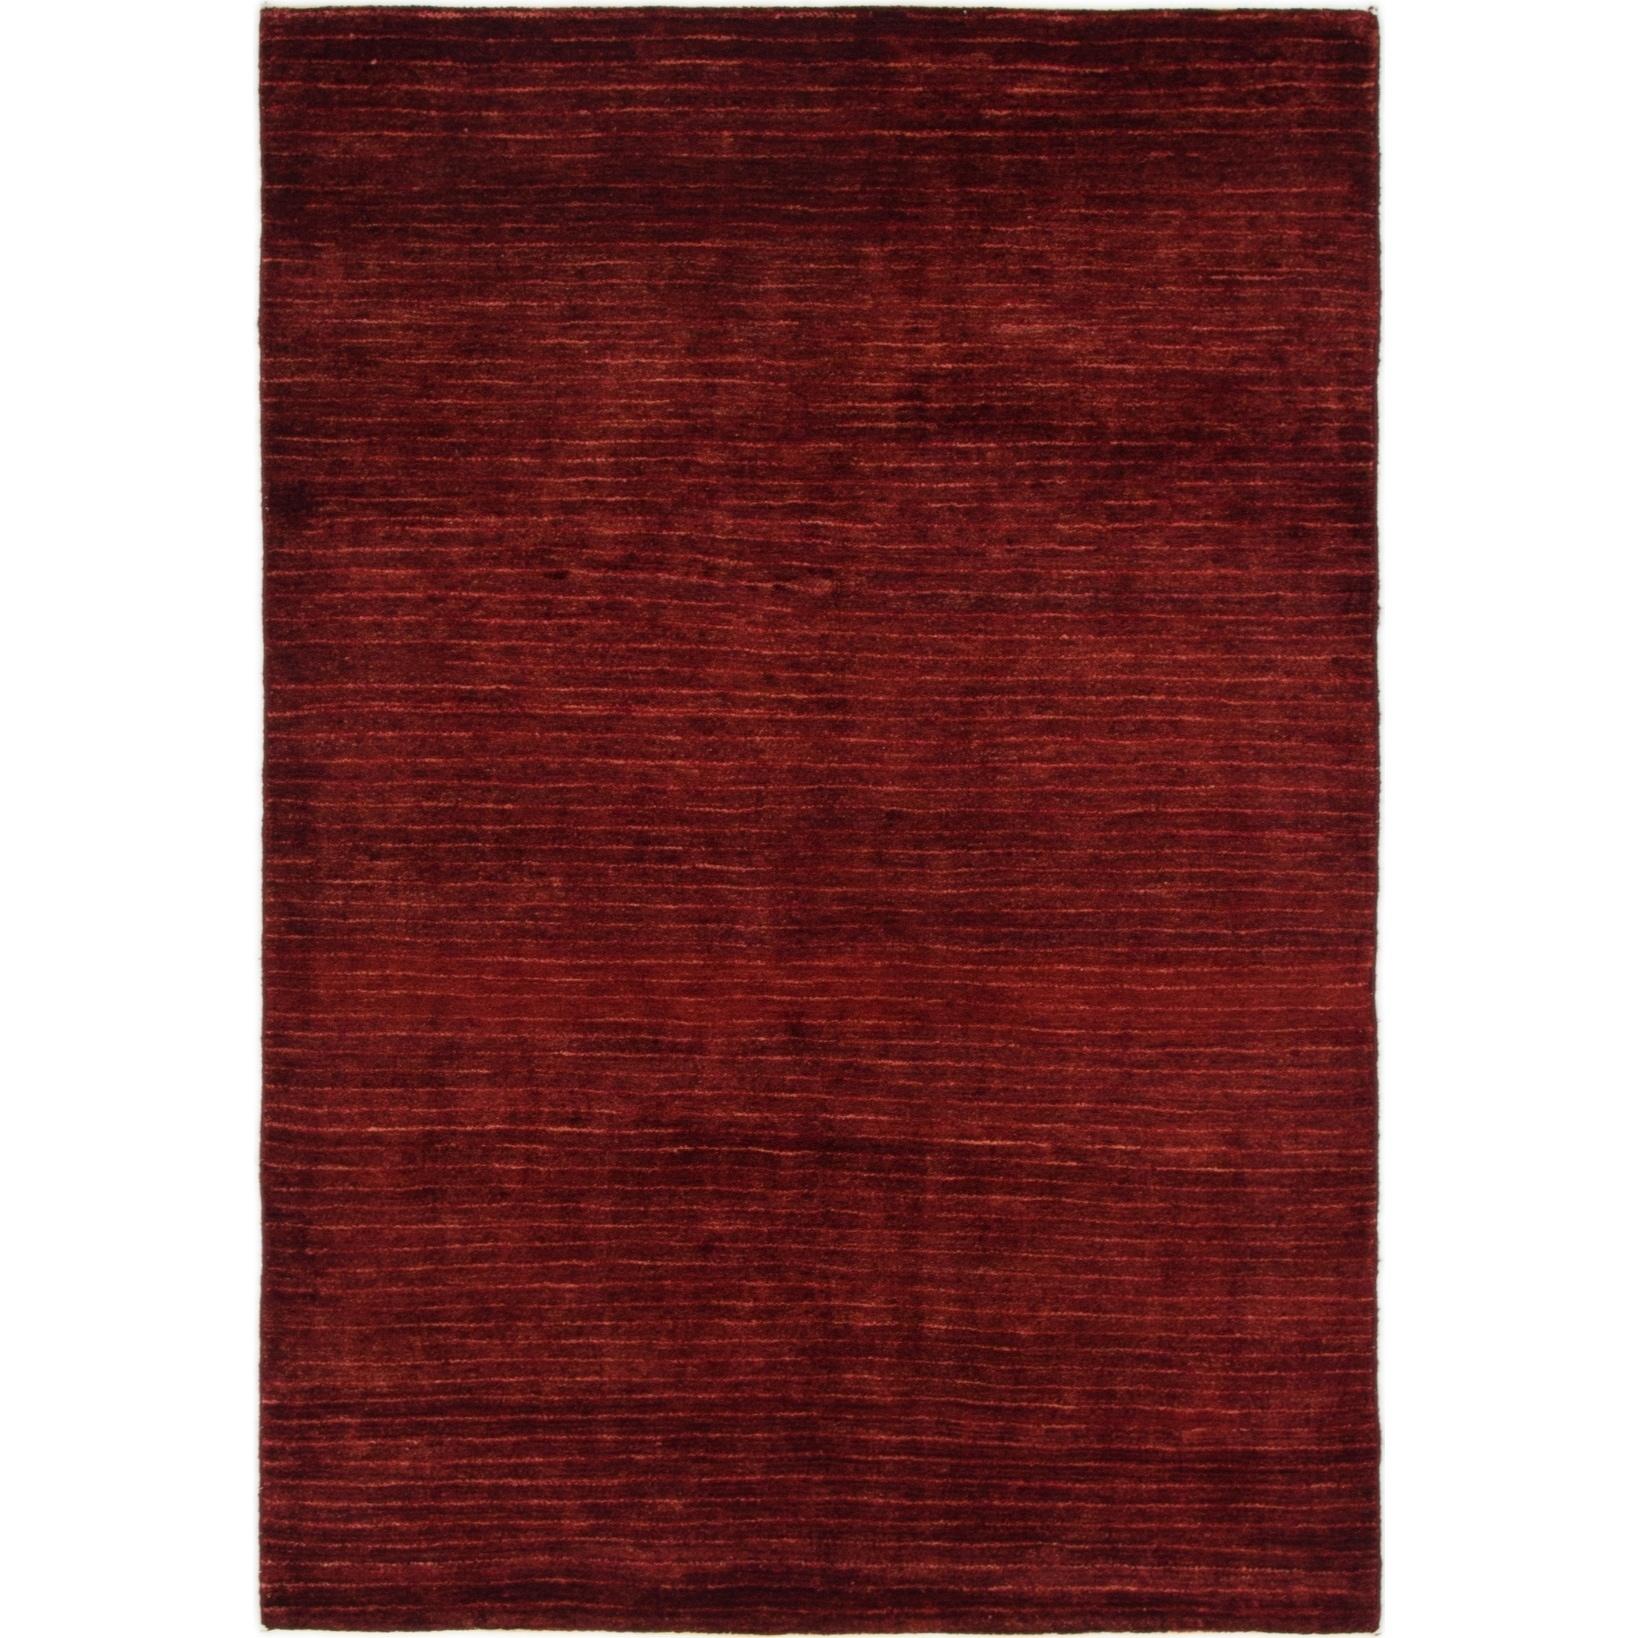 Hand Knotted Kashkuli Gabbeh Wool Area Rug - 4 2 x 6 (Burgundy - 4 2 x 6)